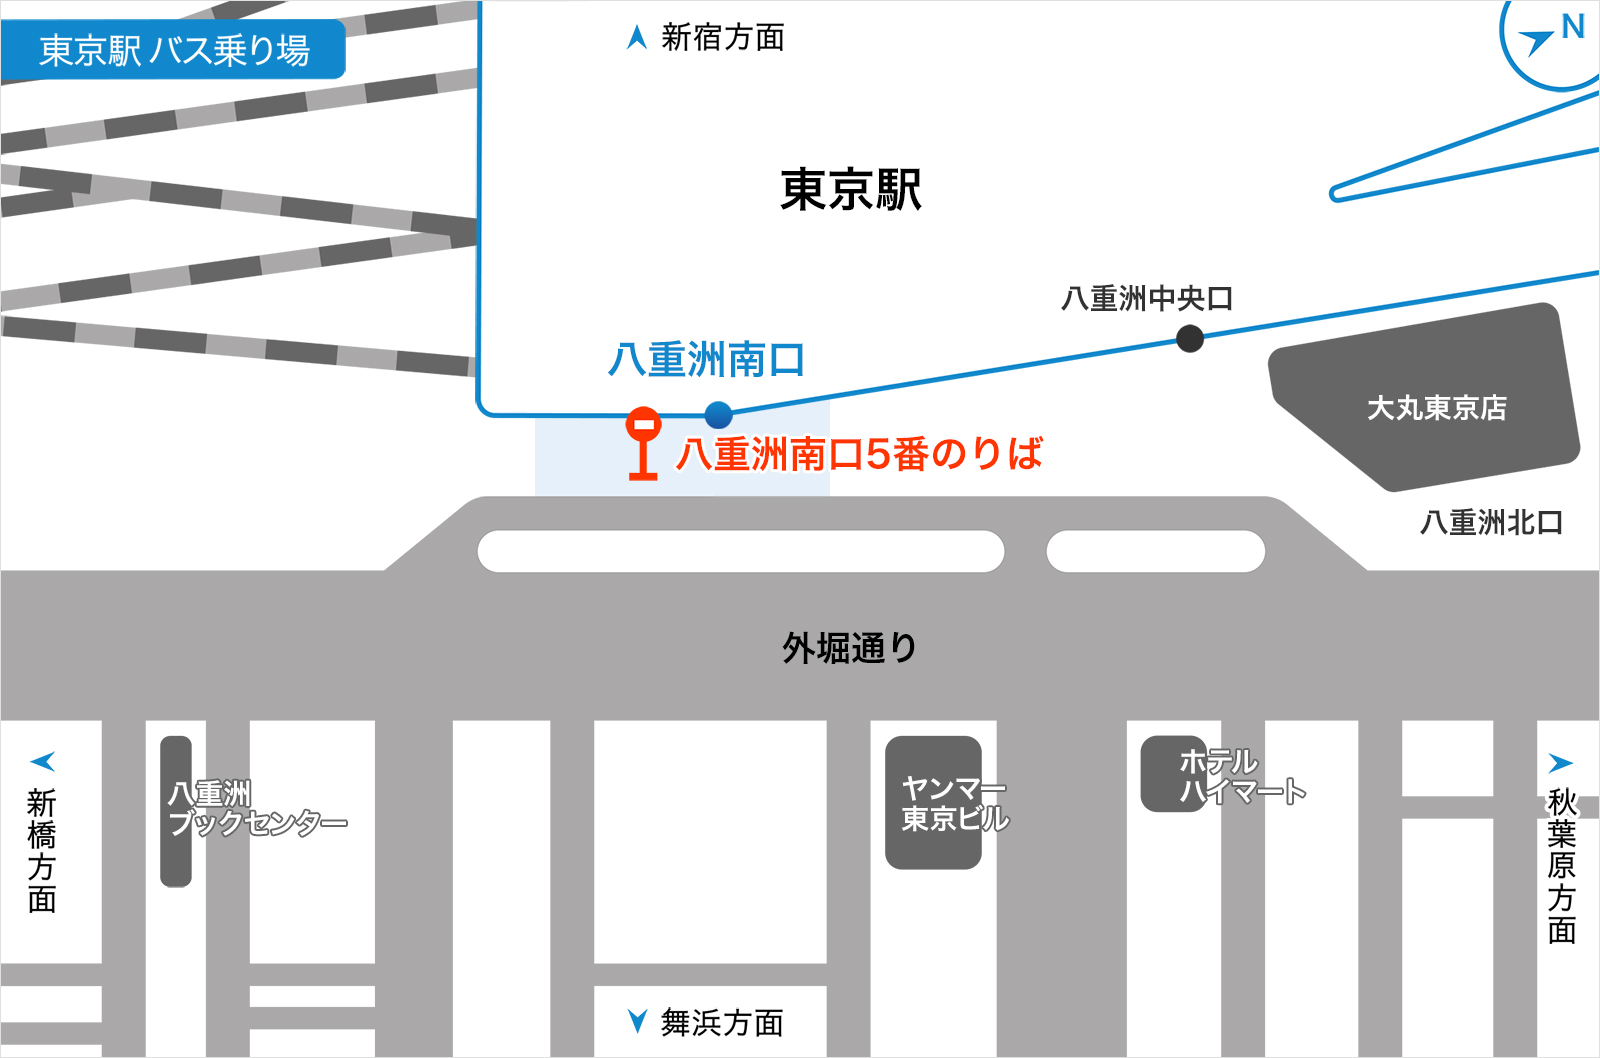 JR東京駅八重洲南口5番のりば